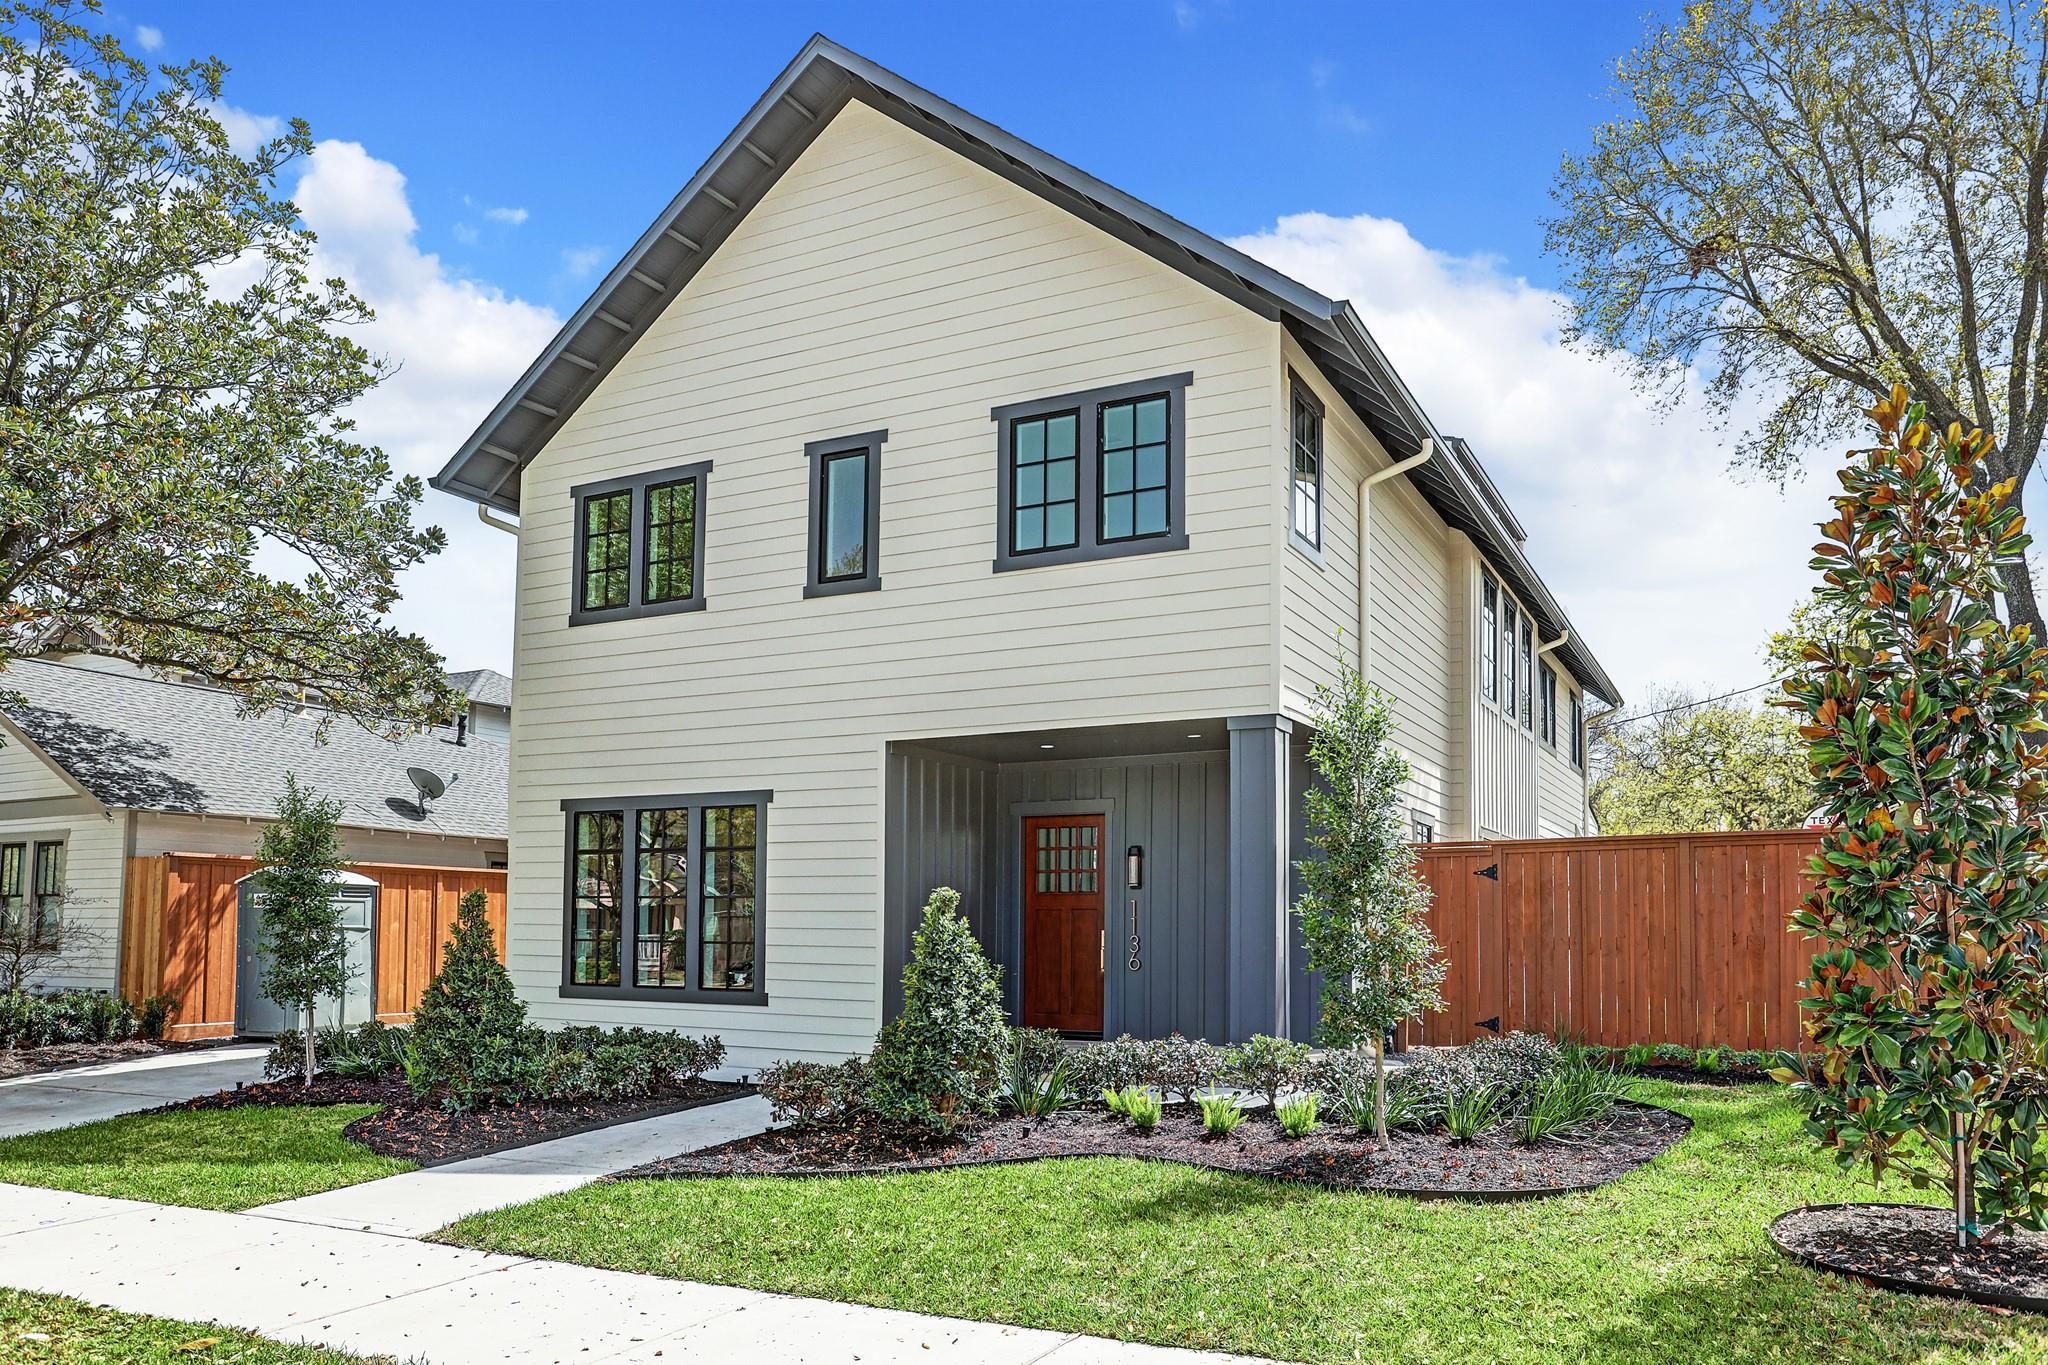 1136 Woodland Property Photo - Houston, TX real estate listing